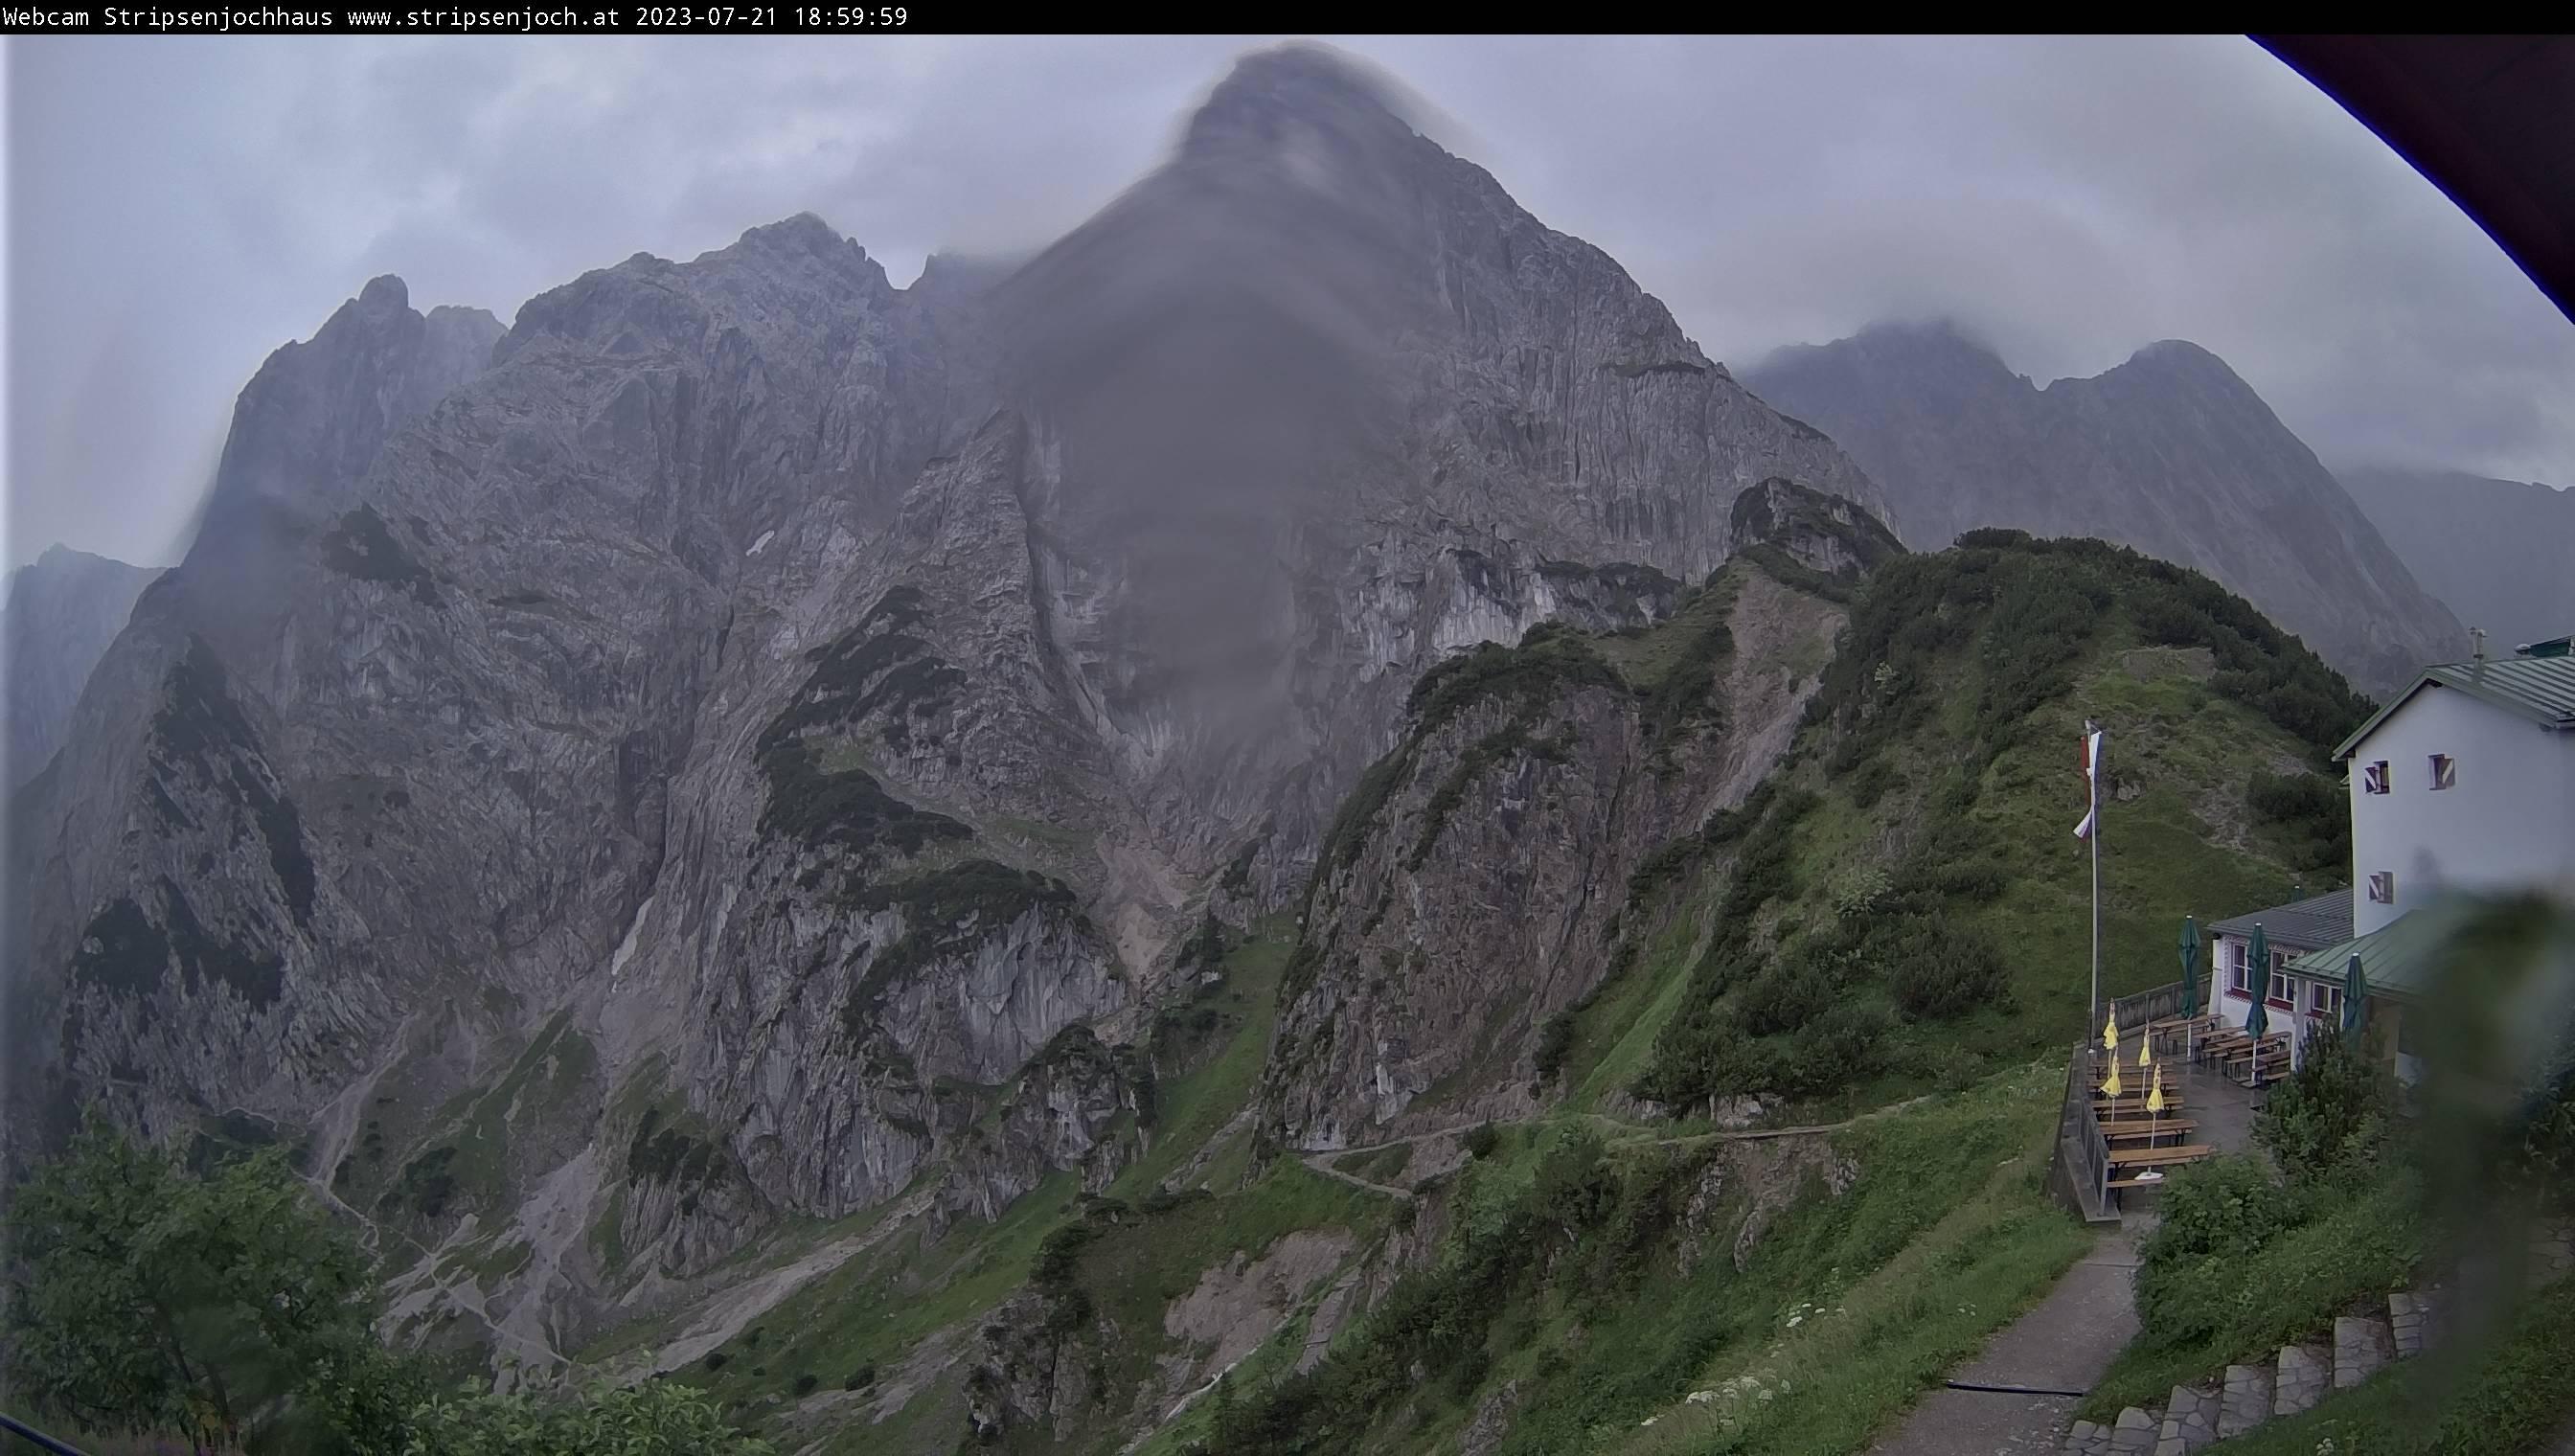 St. Johann / Tirol, Stripsenjoch / Österreich